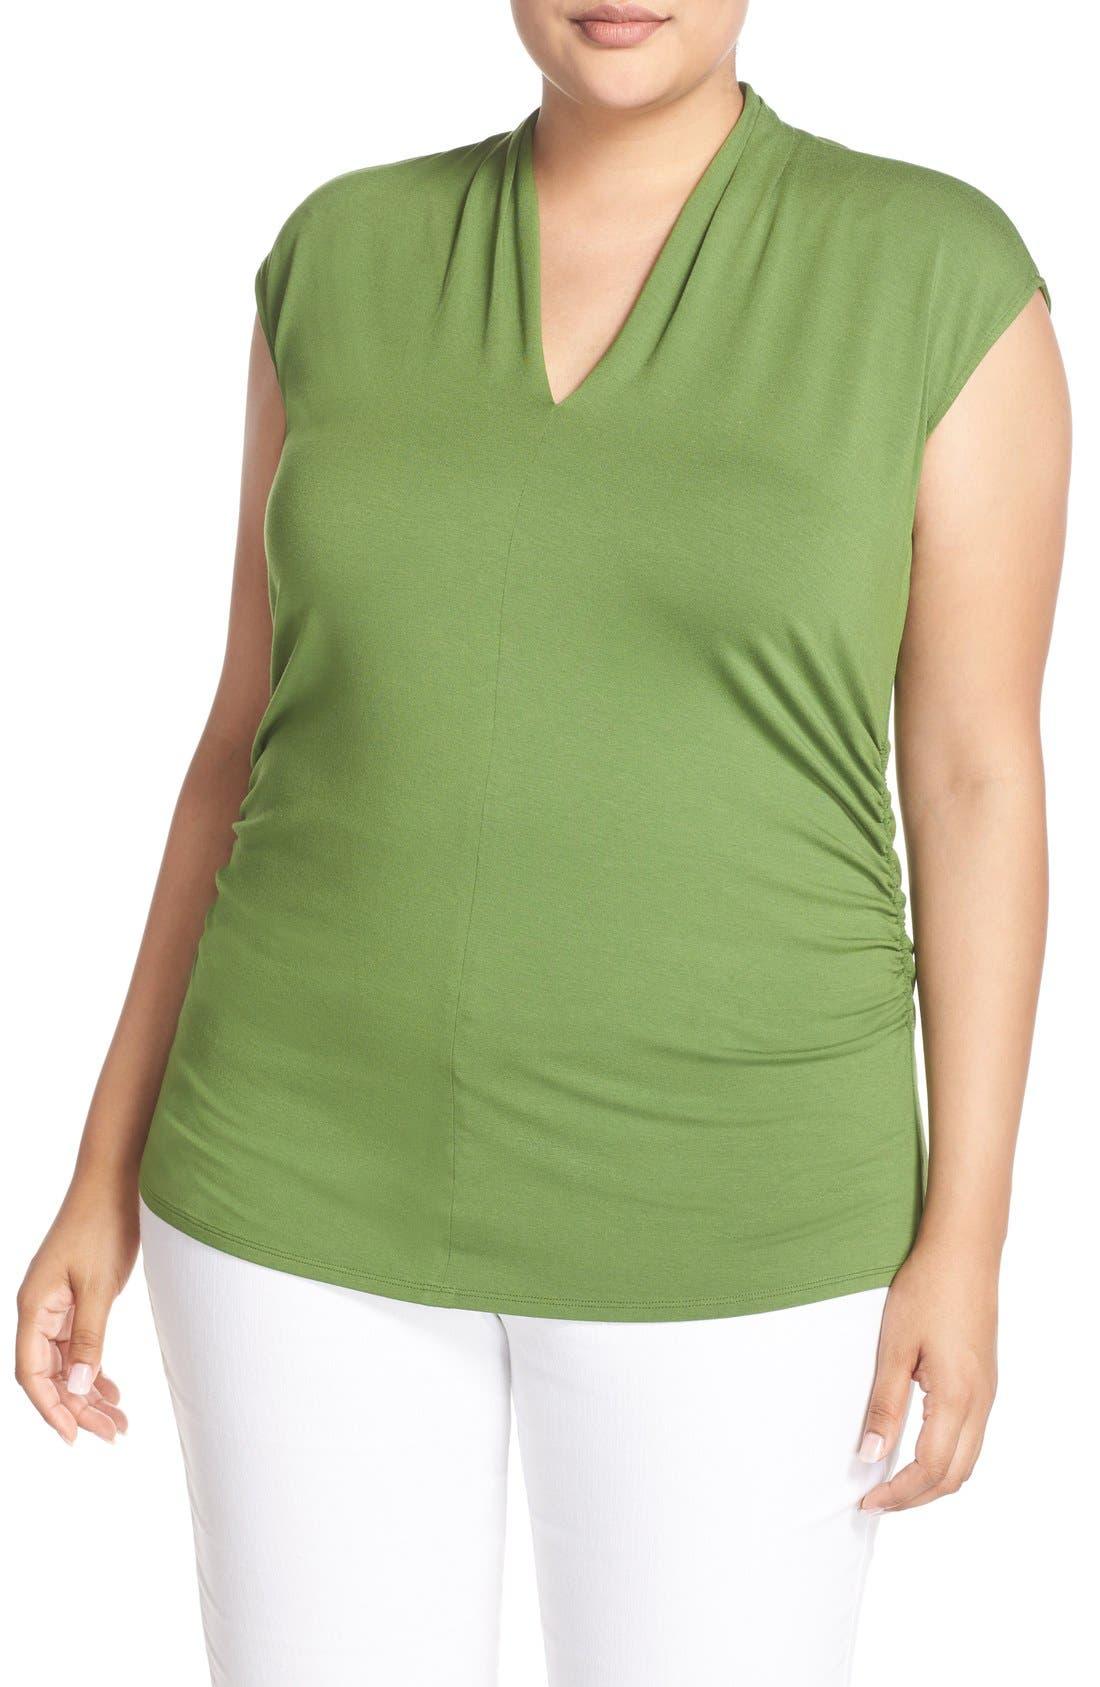 Main Image - Vince Camuto Pleat V-Neck Knit Top (Plus Size)